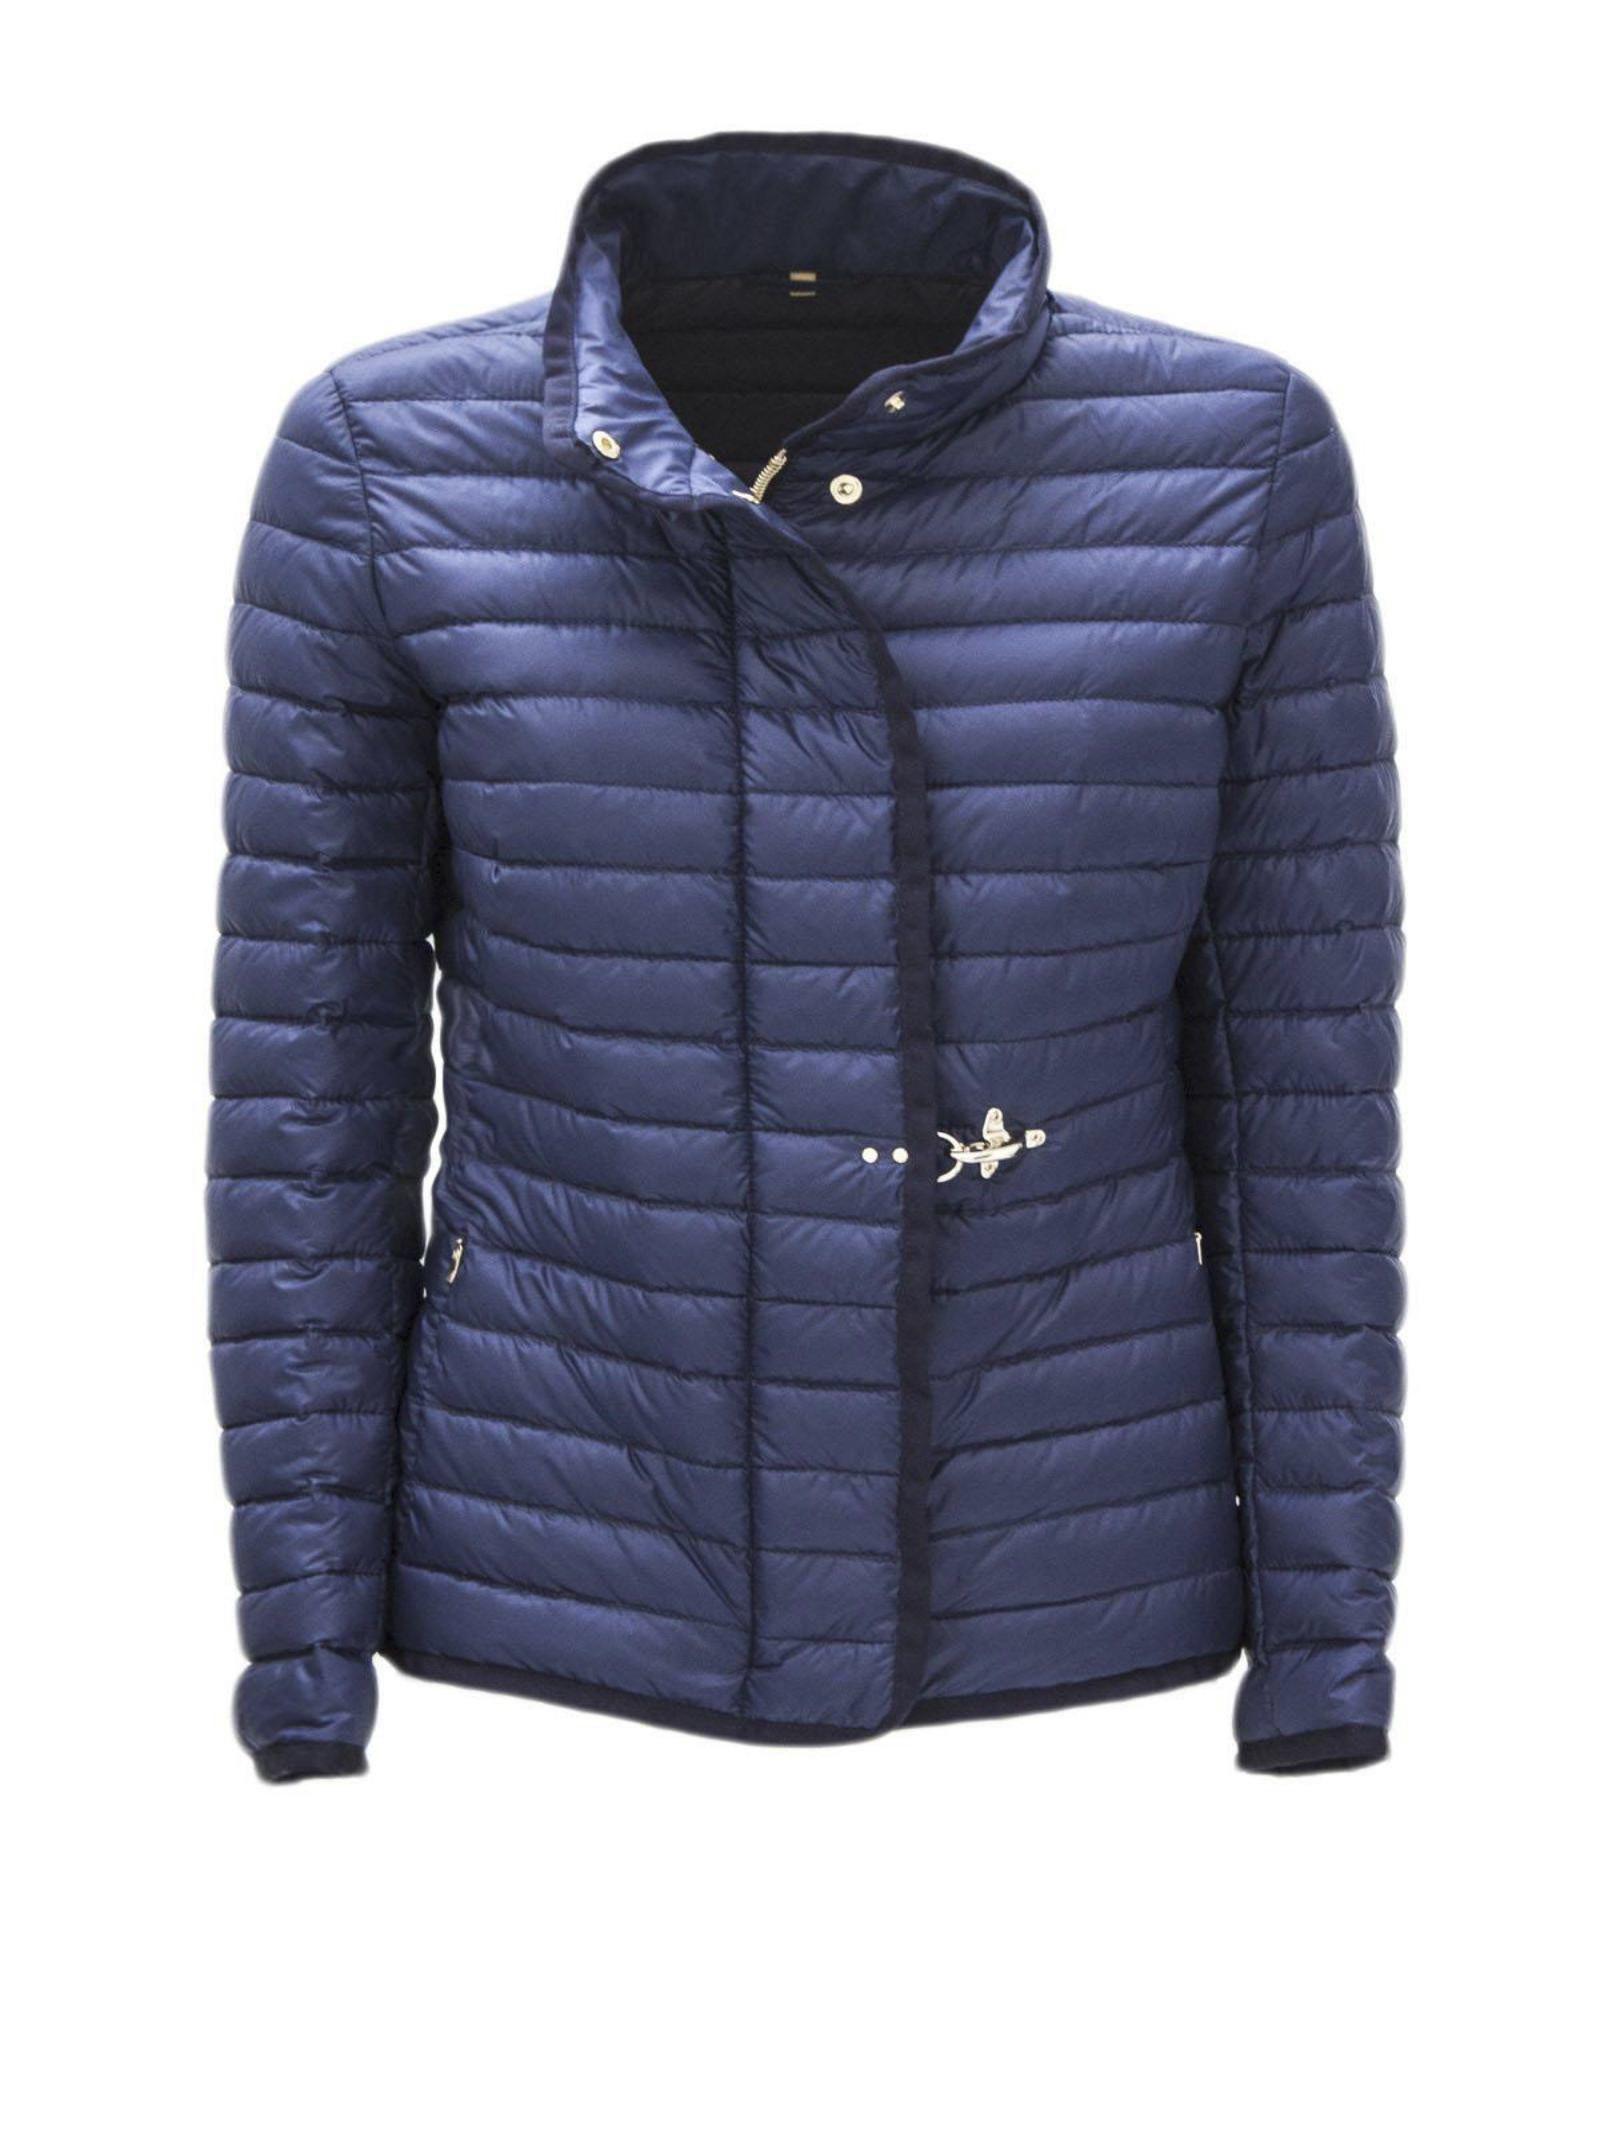 Light Down Jacket In Blue High Tech Fabric